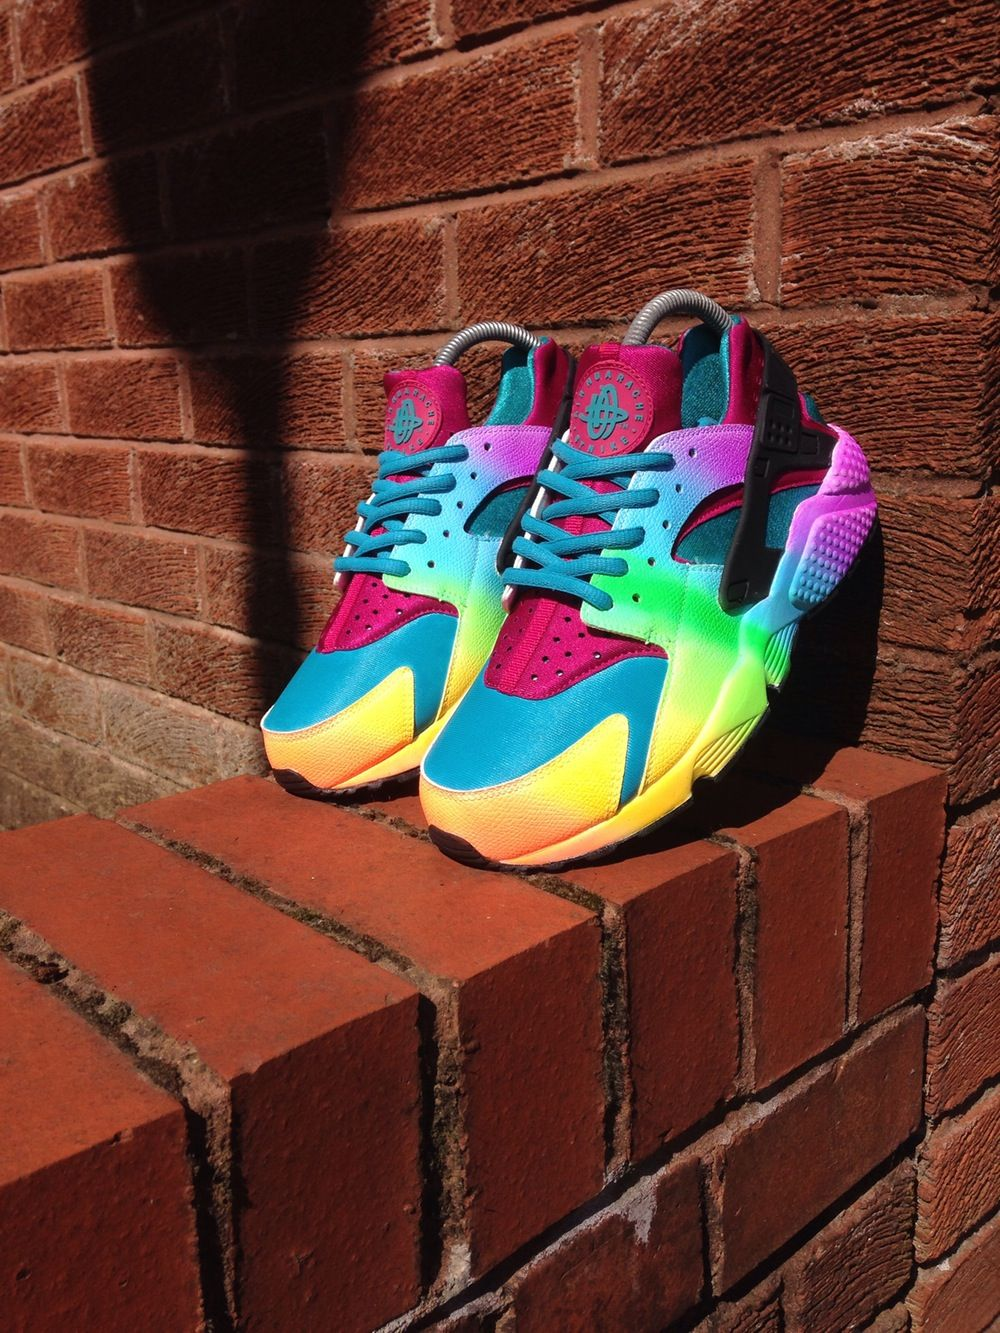 2016 nike air huarache womens rainbow shoes hot | Nike shoes girls ...